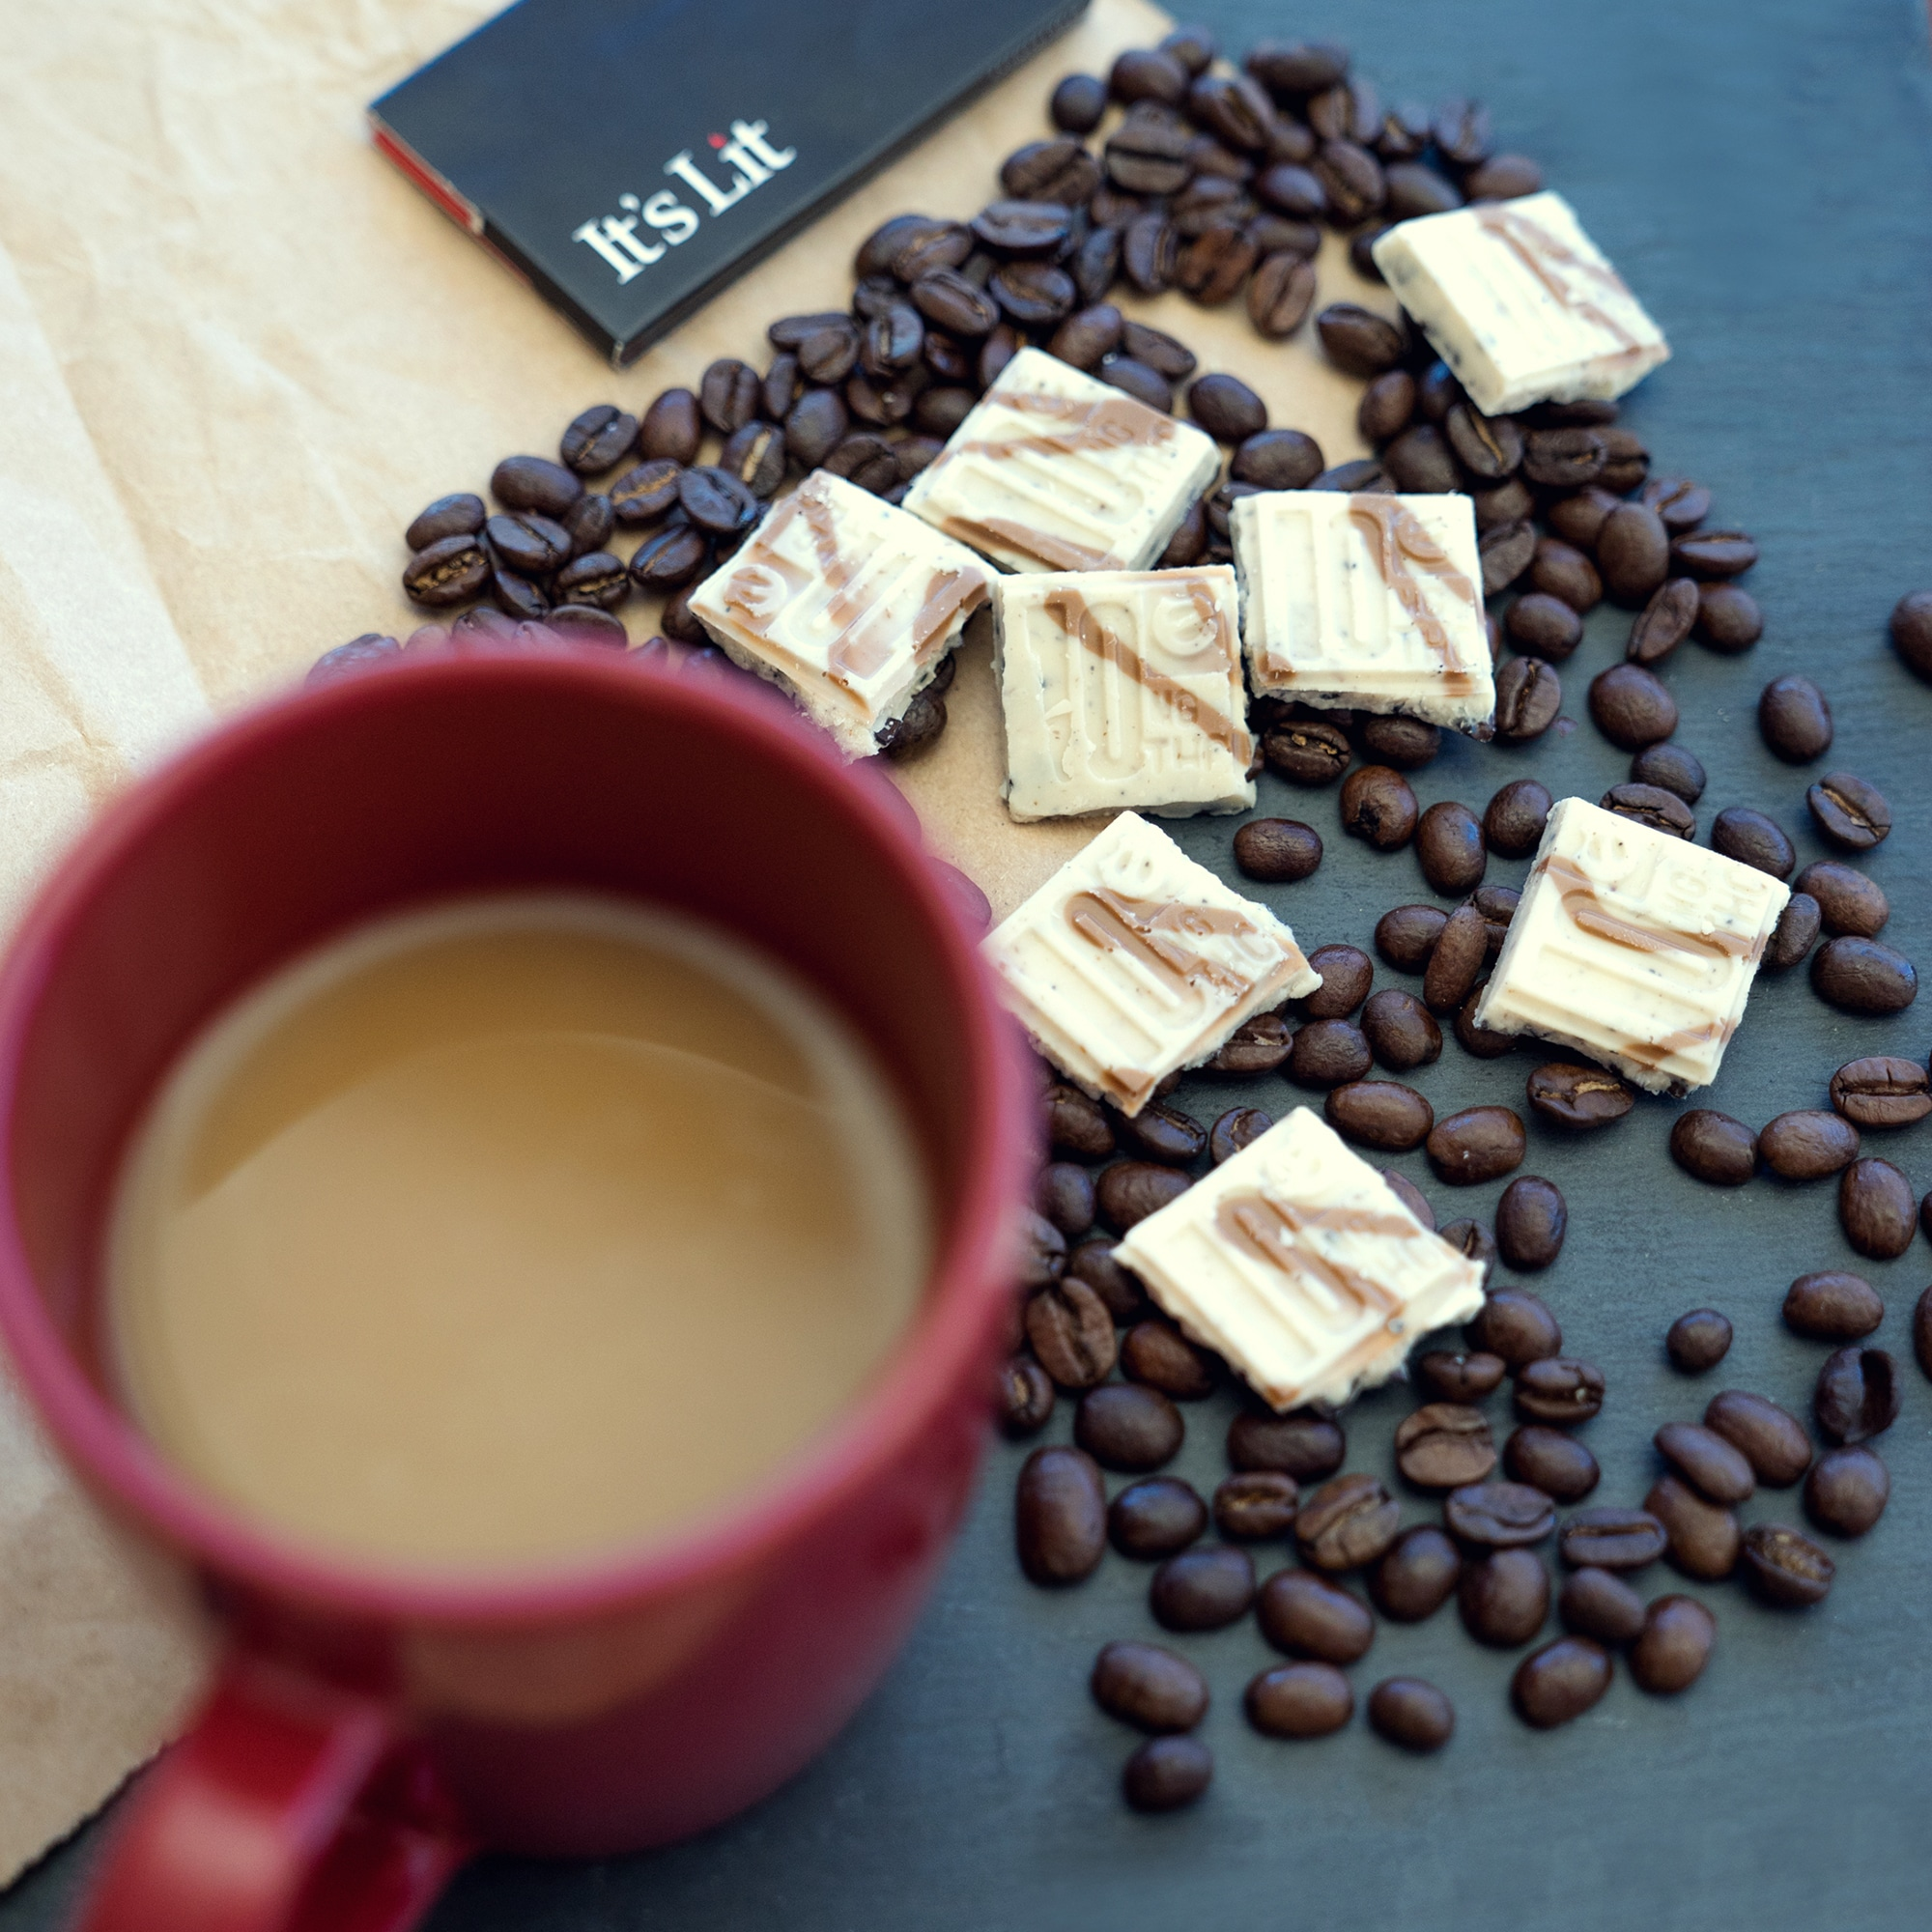 Image of Marijuana Edibles and coffee beans